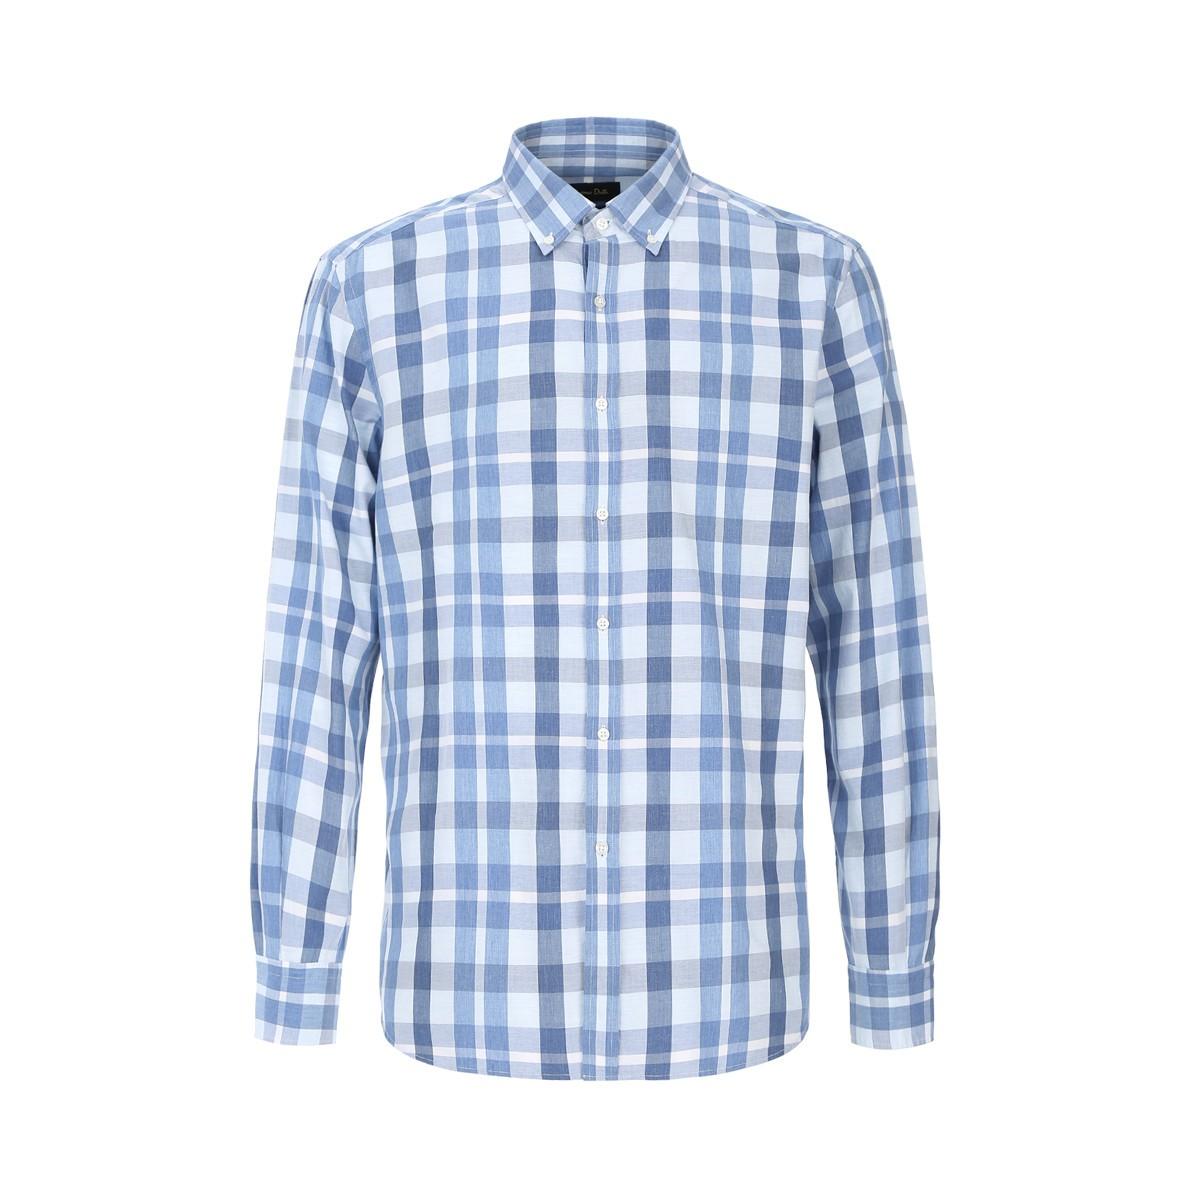 Massimo Dutti 14242400 男款格子长袖衬衫